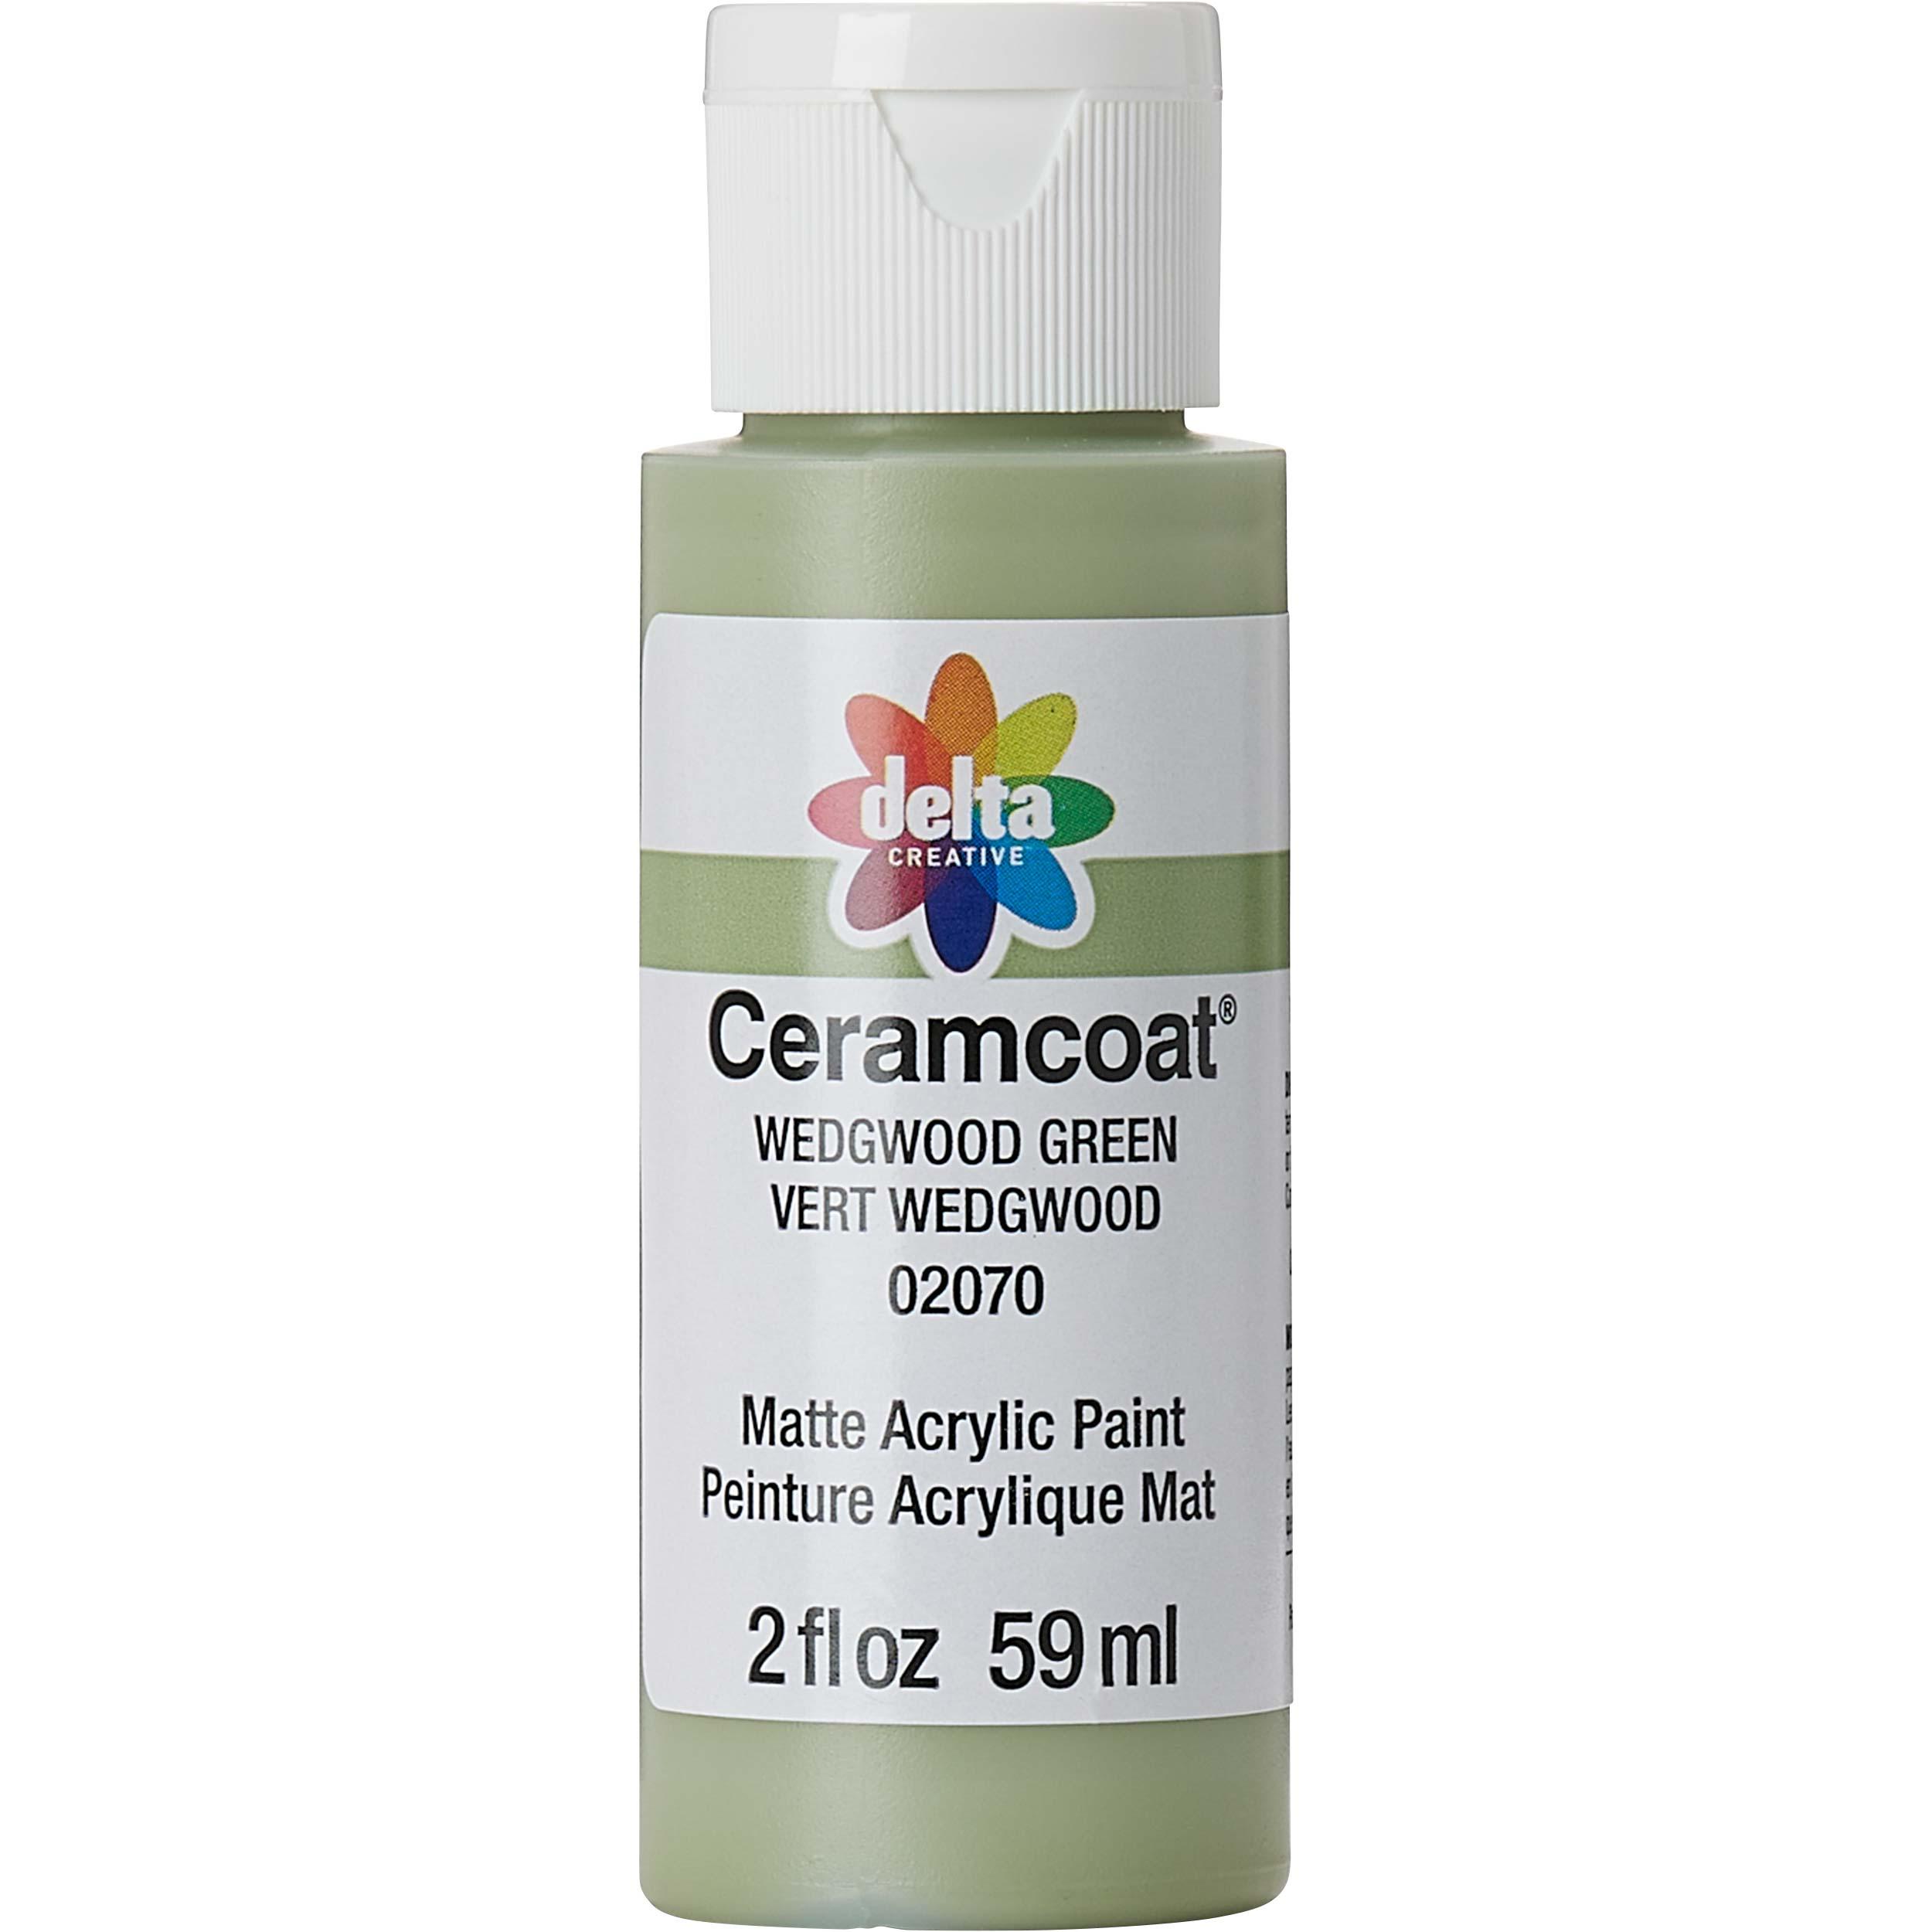 Delta Ceramcoat ® Acrylic Paint - Wedgewood Green, 2 oz.